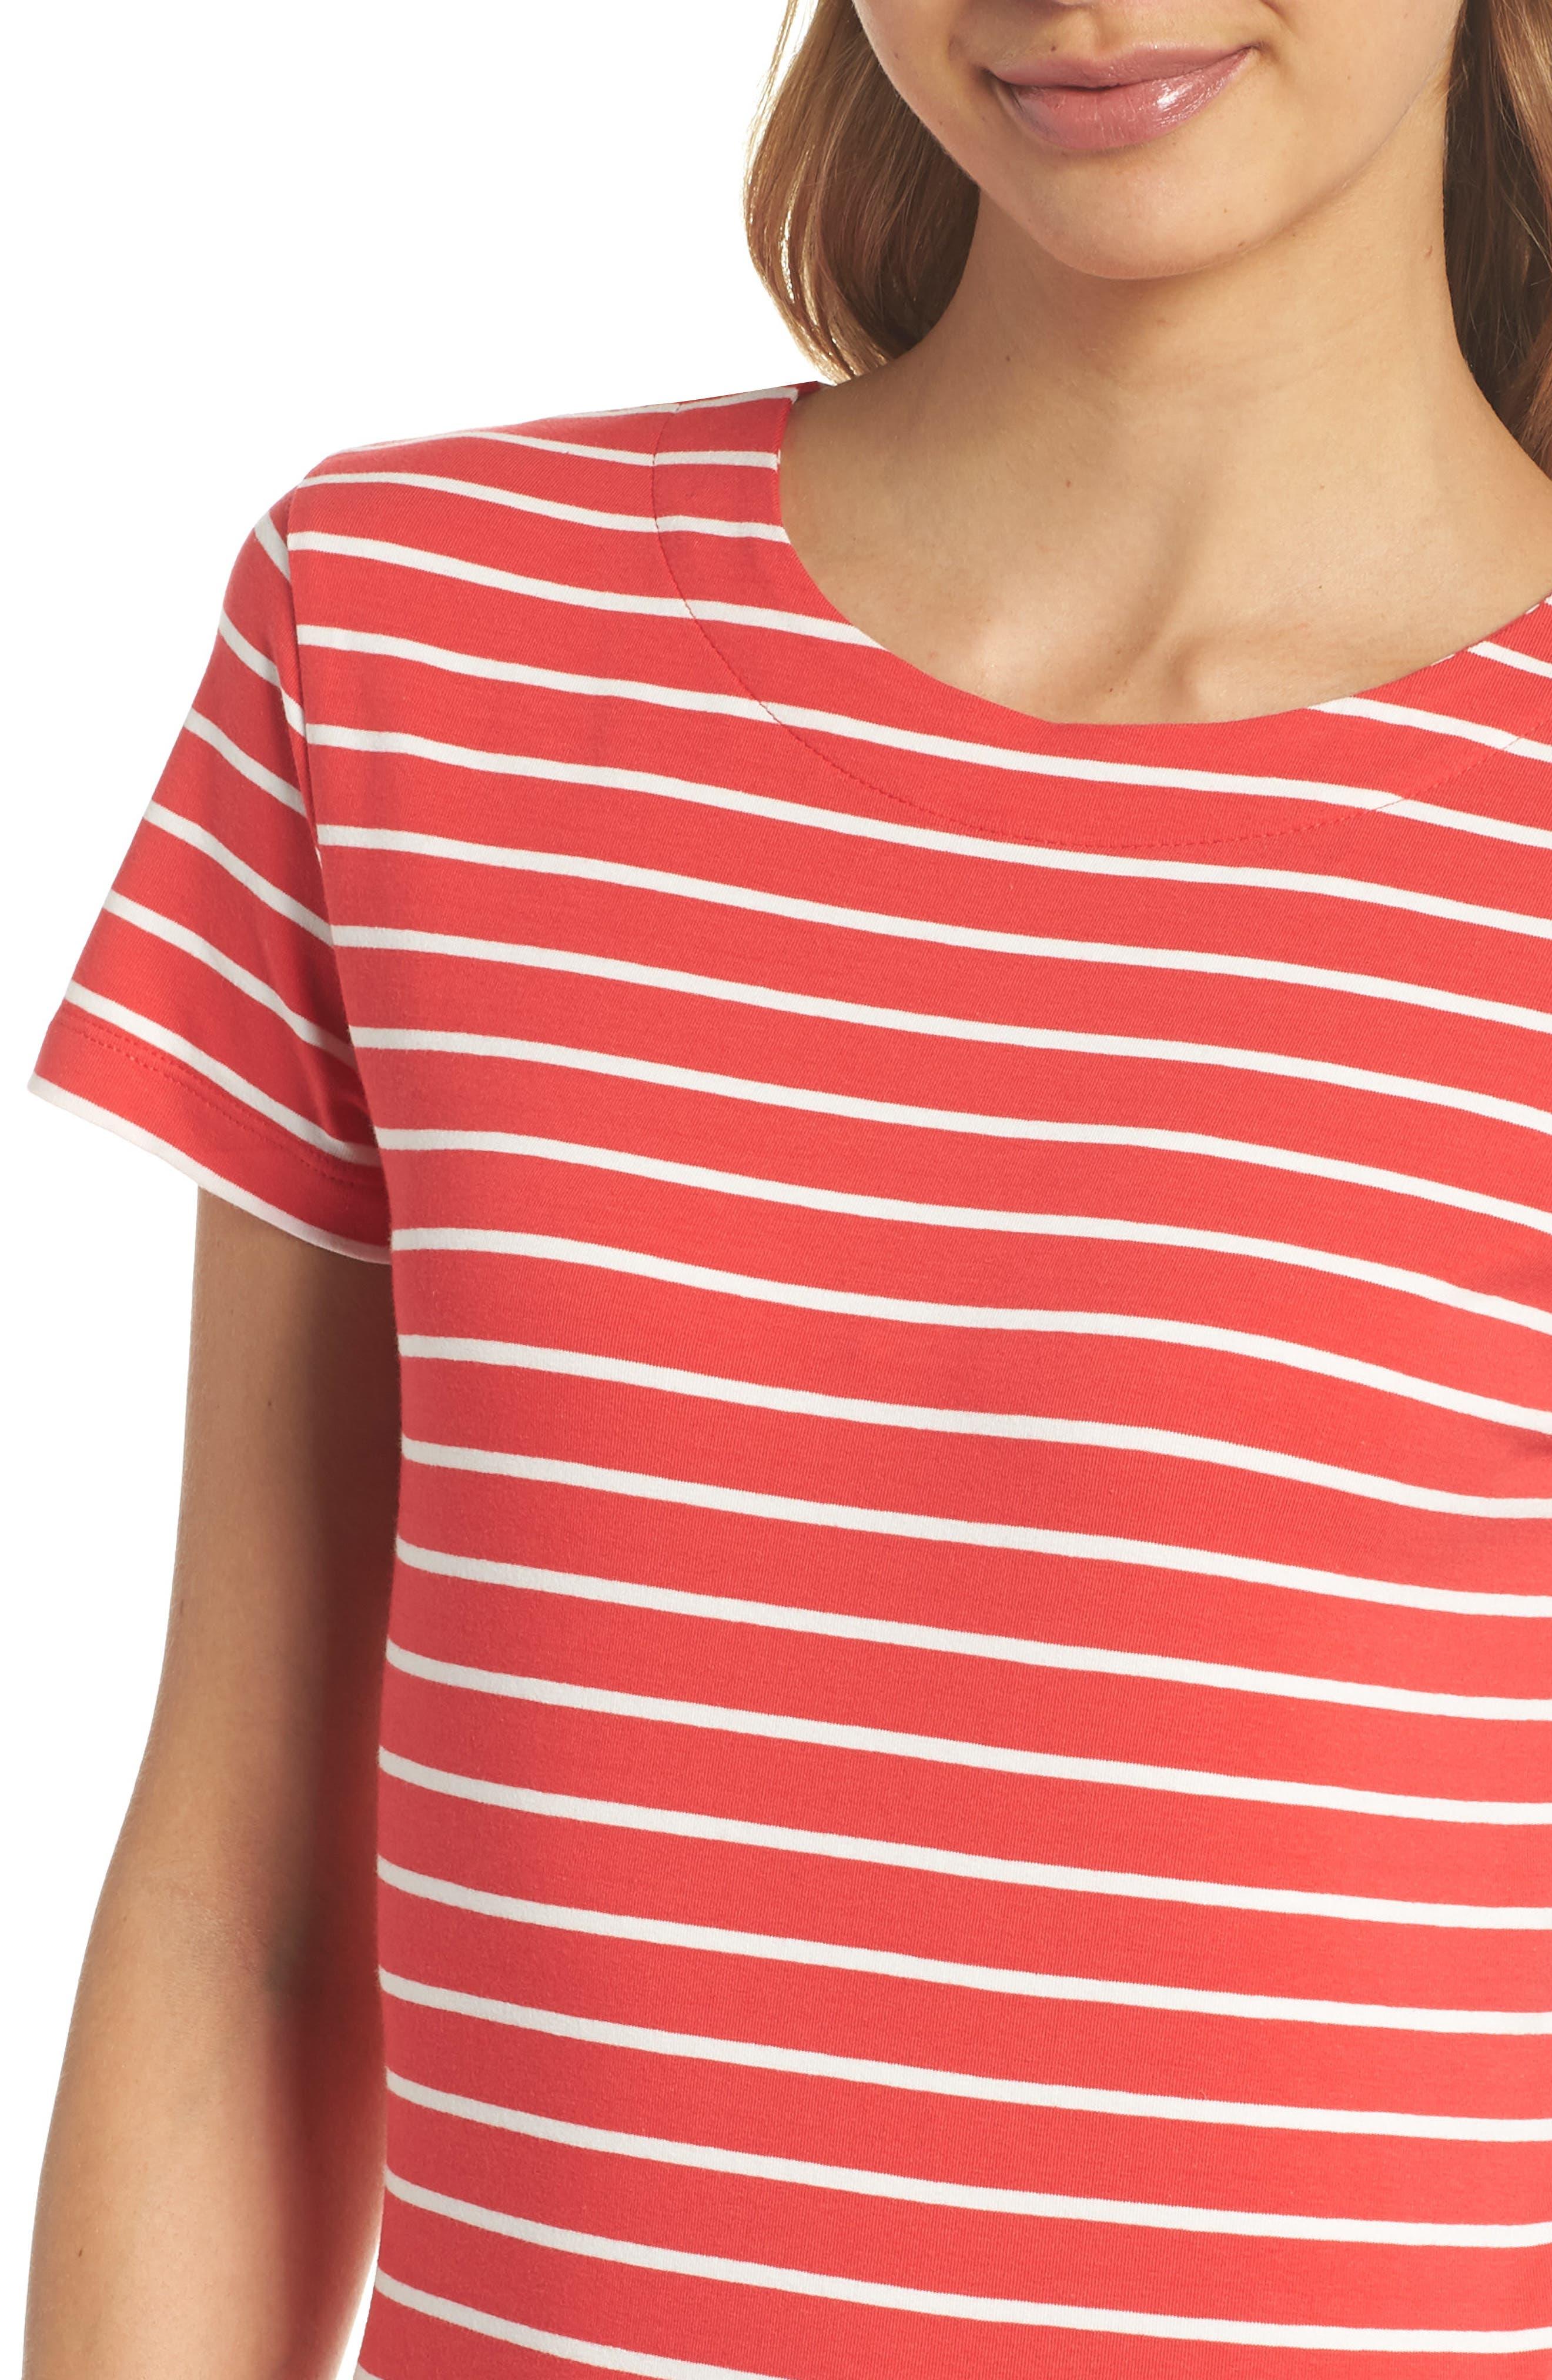 Knit Stripe Body-Con Dress,                             Alternate thumbnail 4, color,                             Shanghai Red/ Summer White